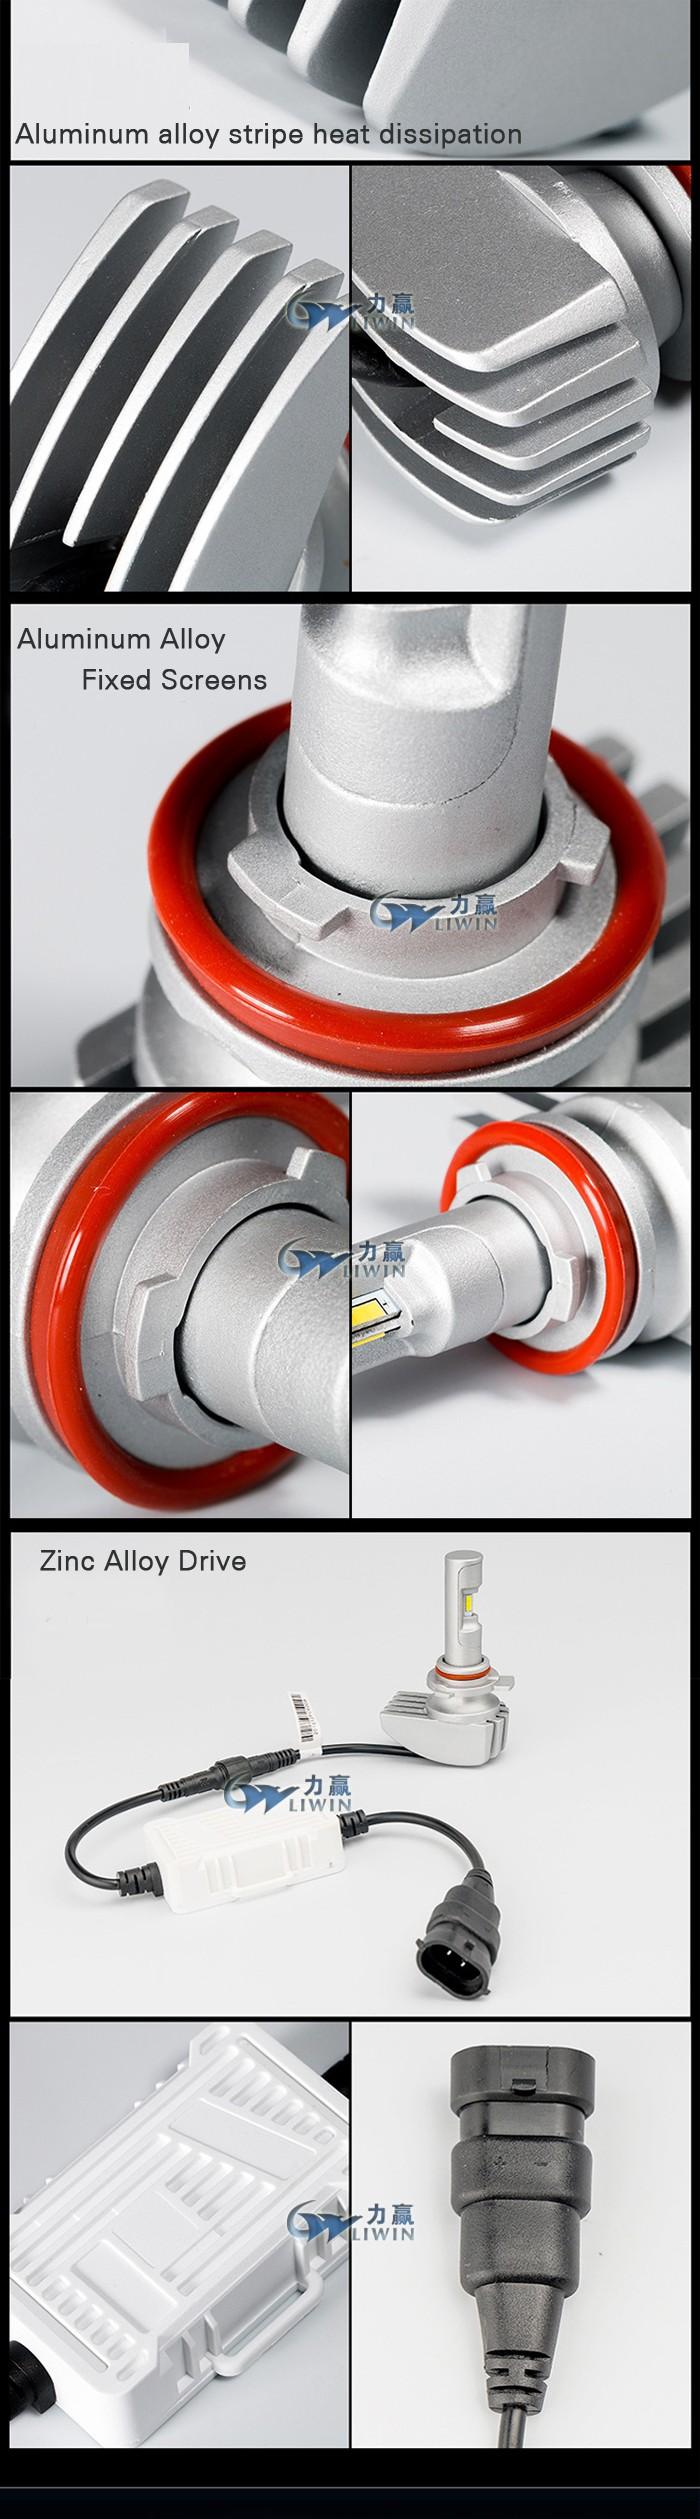 3. W1 38W 4800LM LED LAMP.jpg